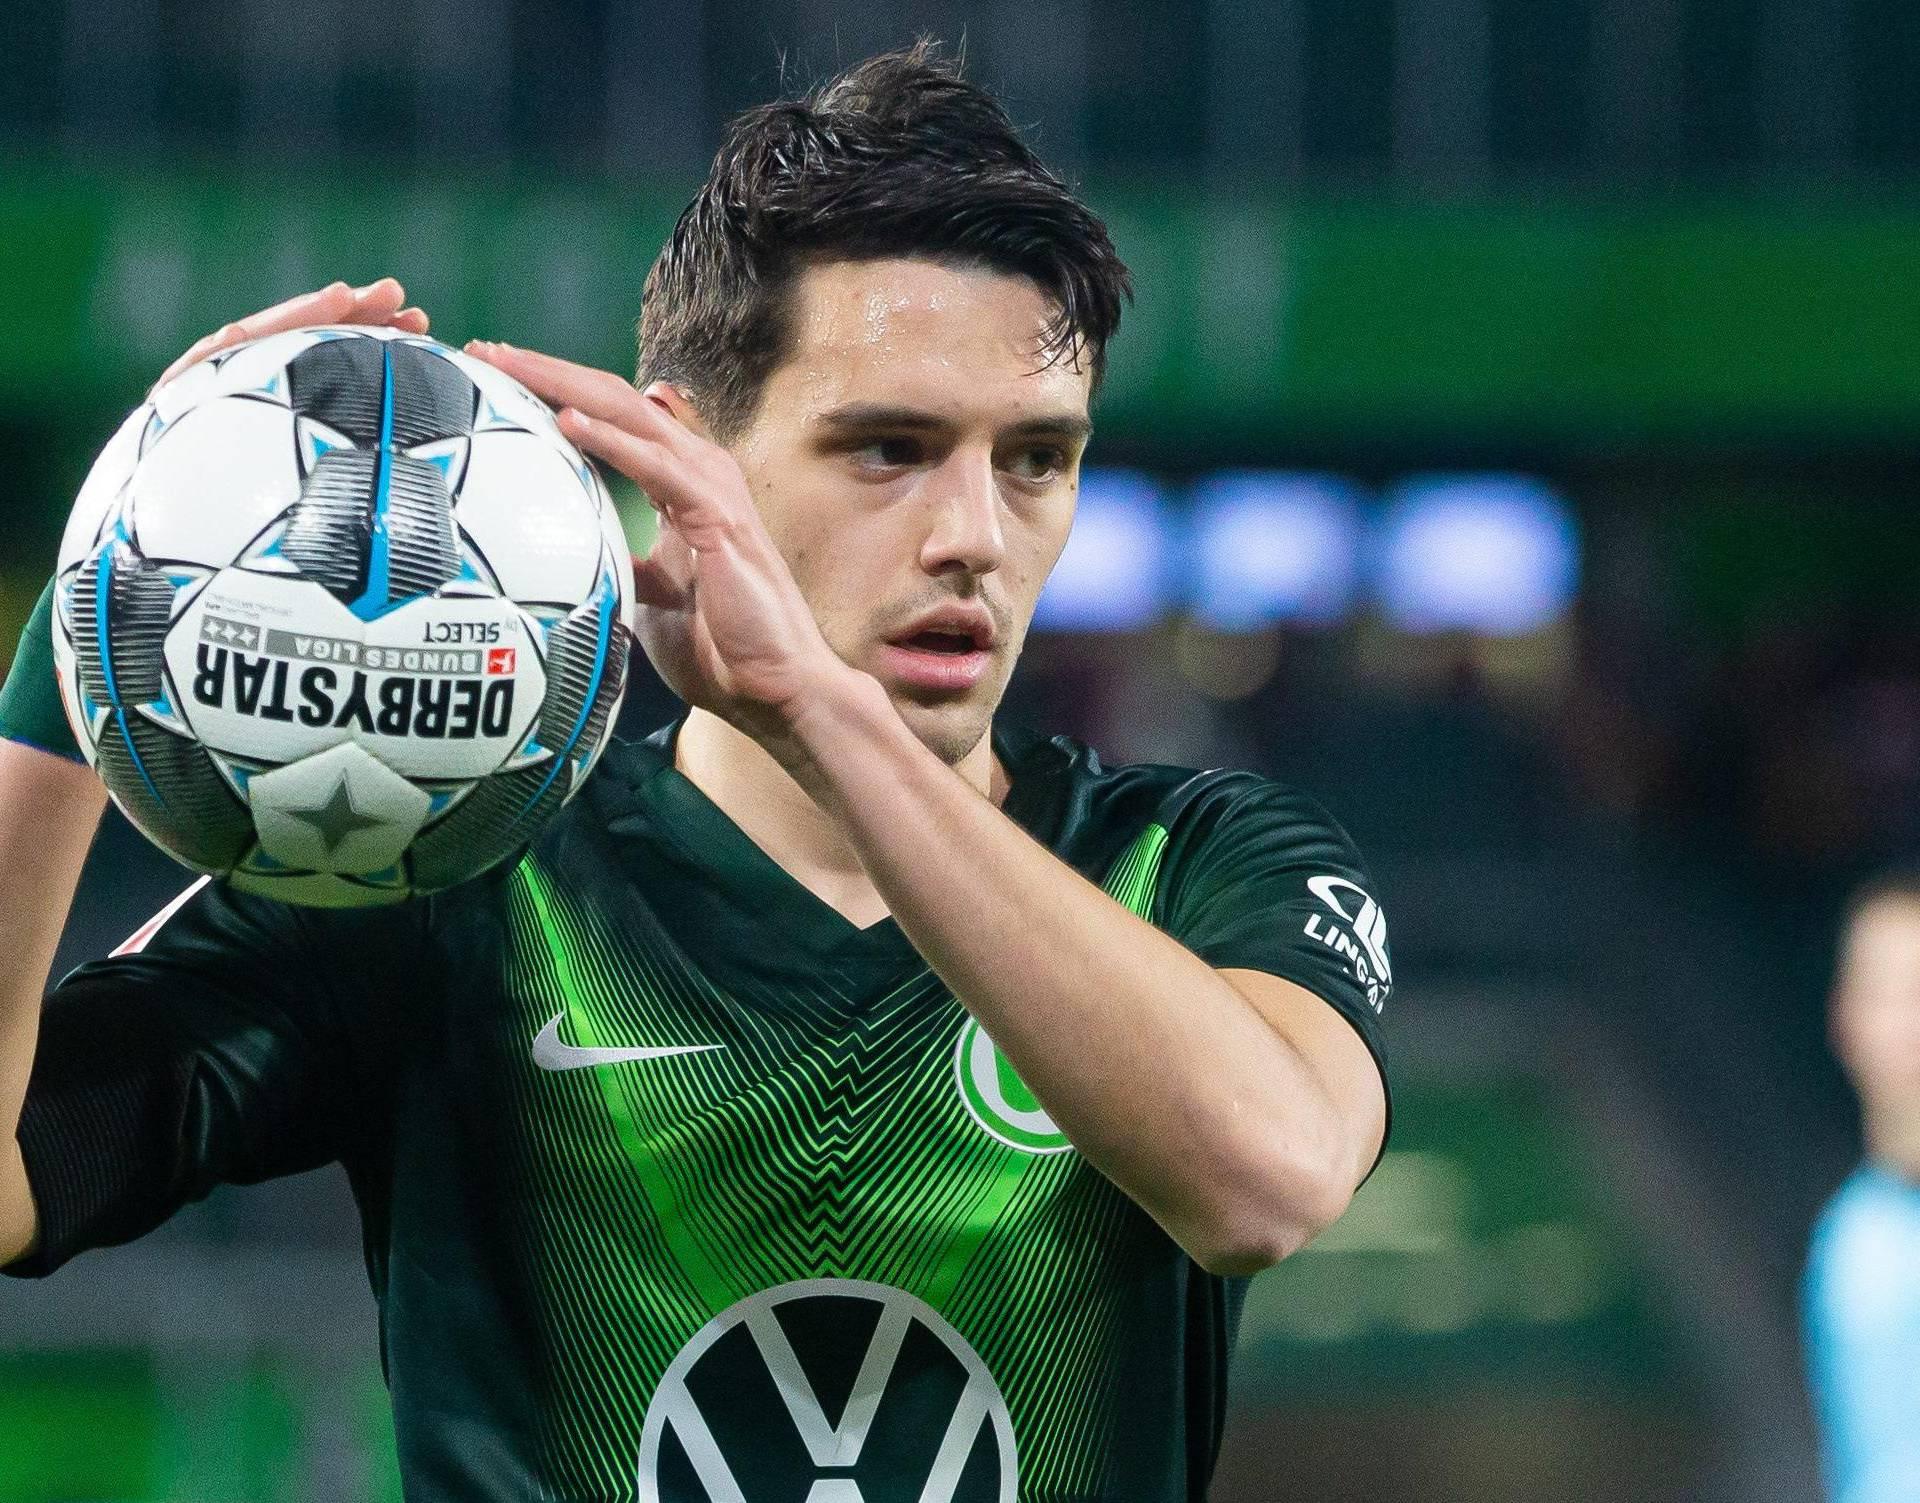 firo: 23.02.2020, Fuvuball, 1.Bundesliga, season 2019/2020, VfL Wolfsburg - FSV FSV FSV Mainz 05